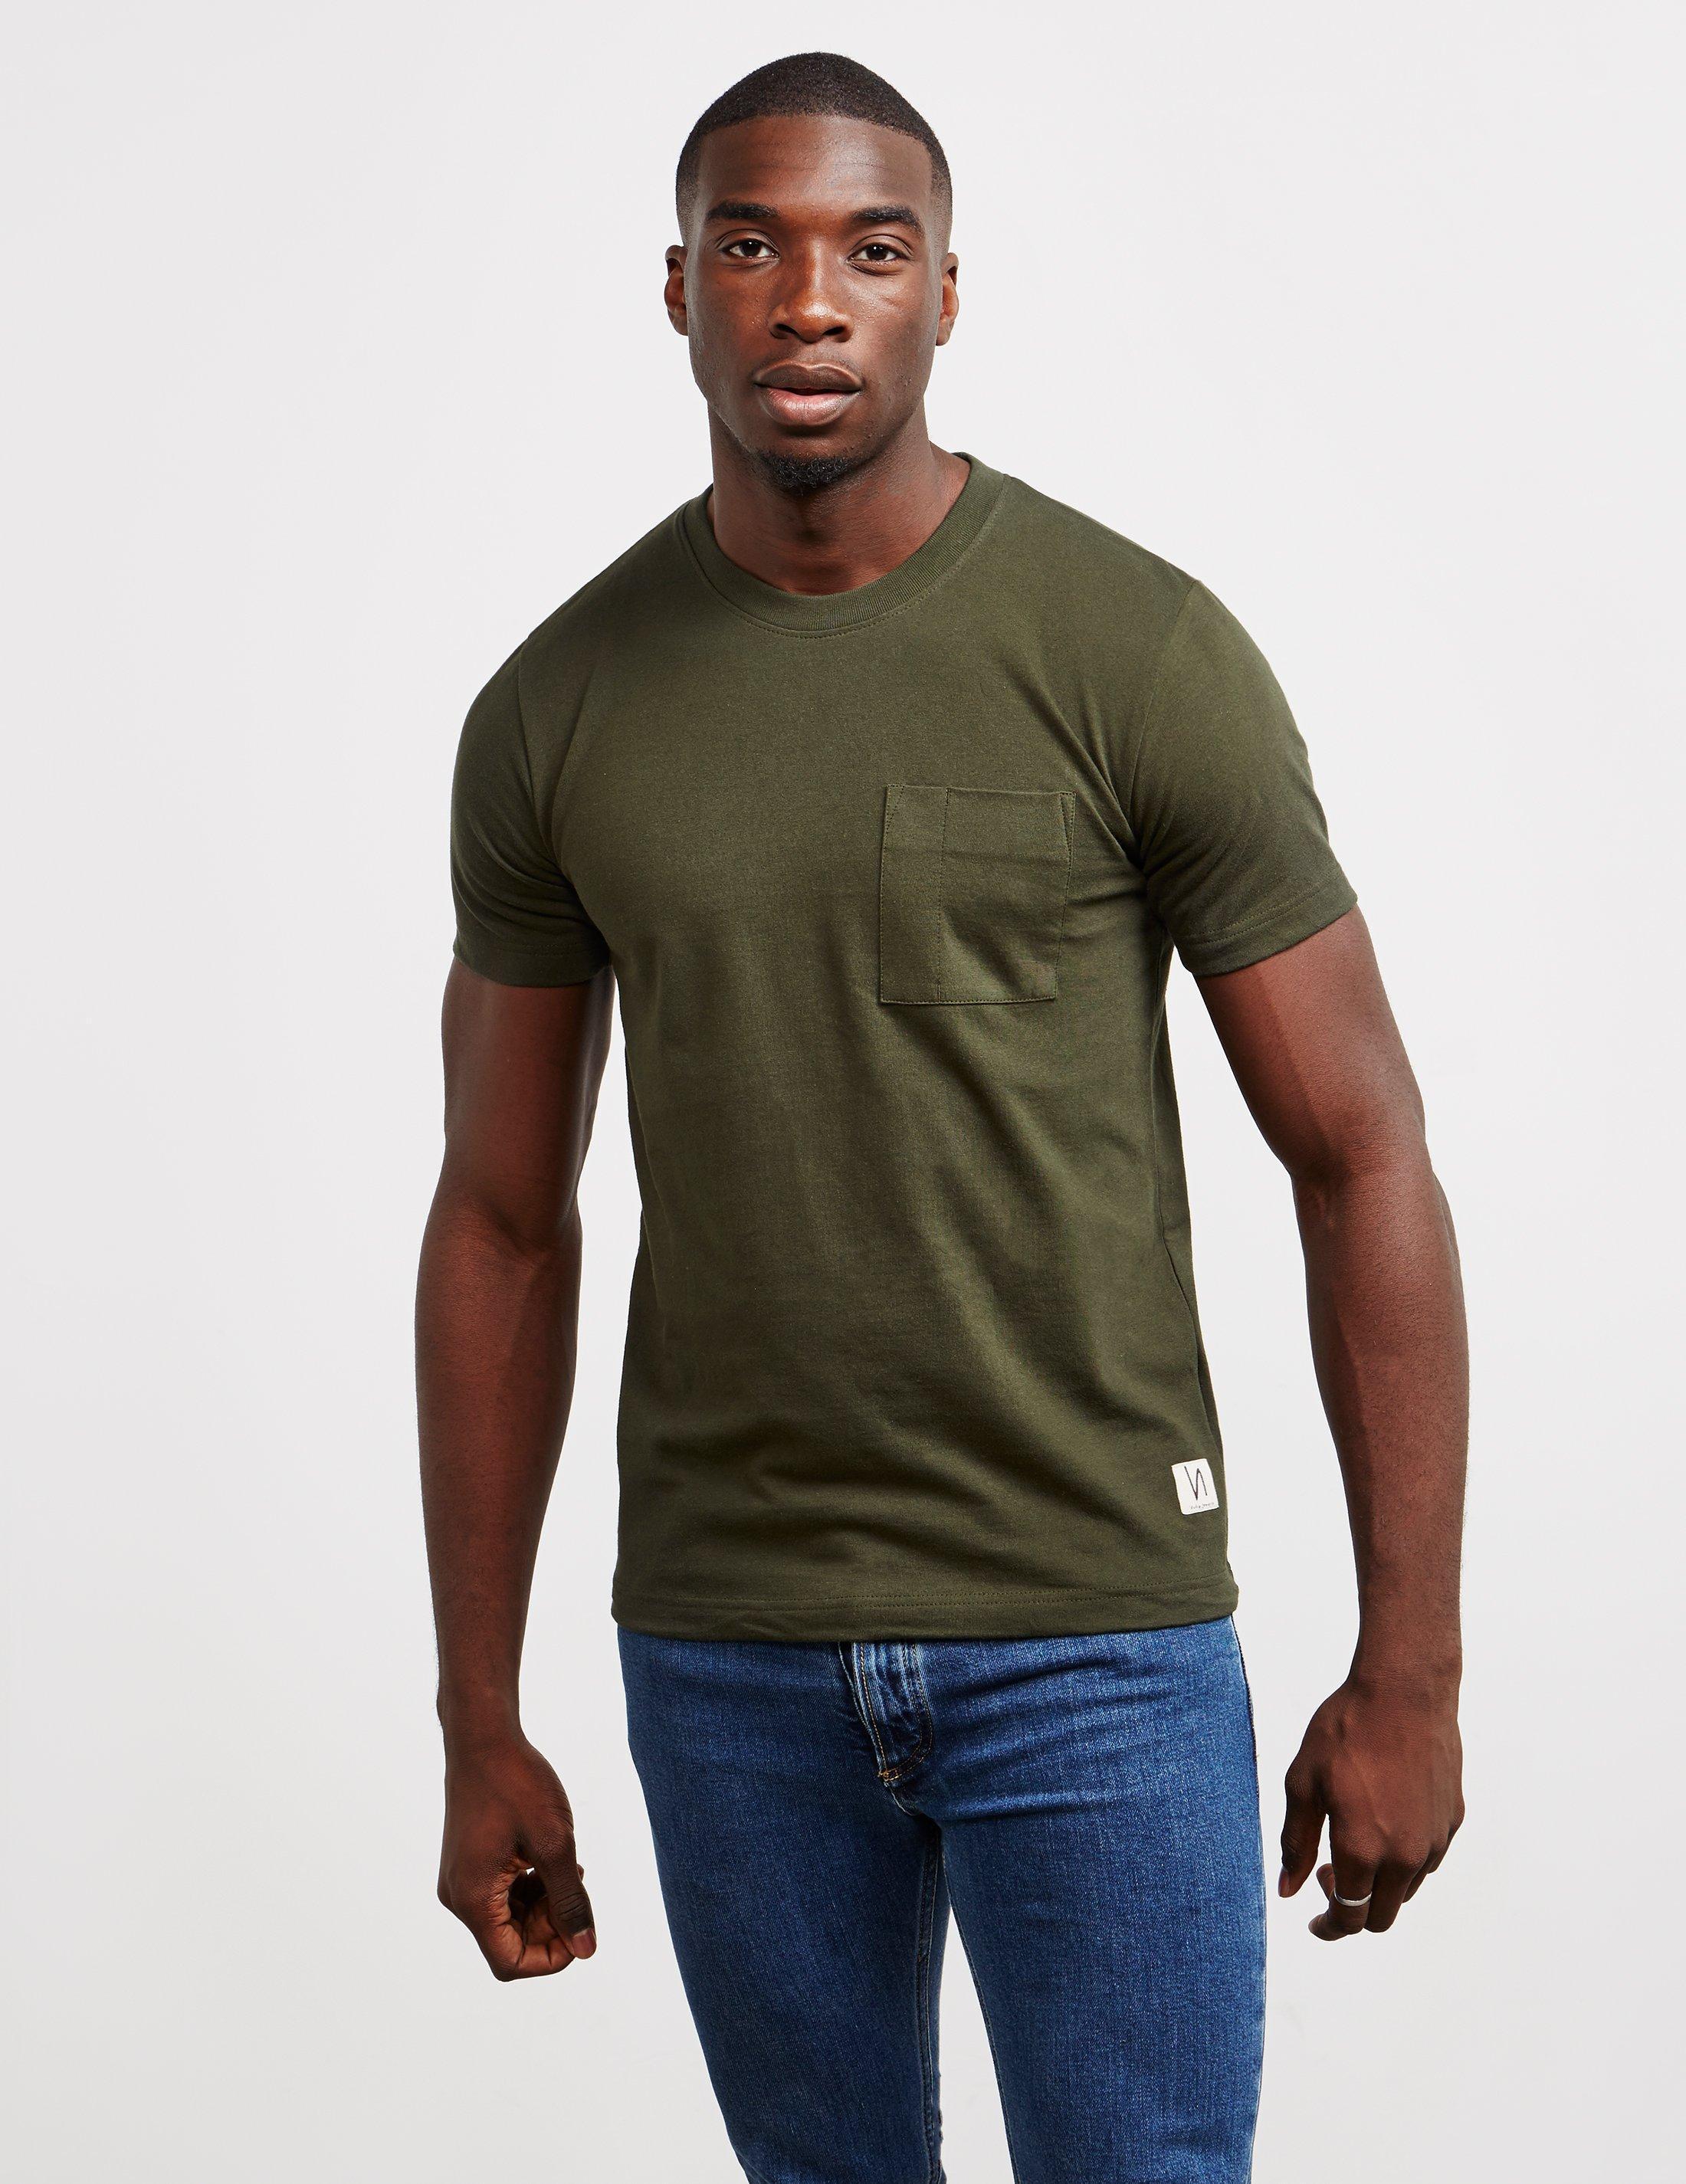 a9943a19 Lyst - Nudie Jeans Kurt Short Sleeve T-shirt - Online Exclusive ...